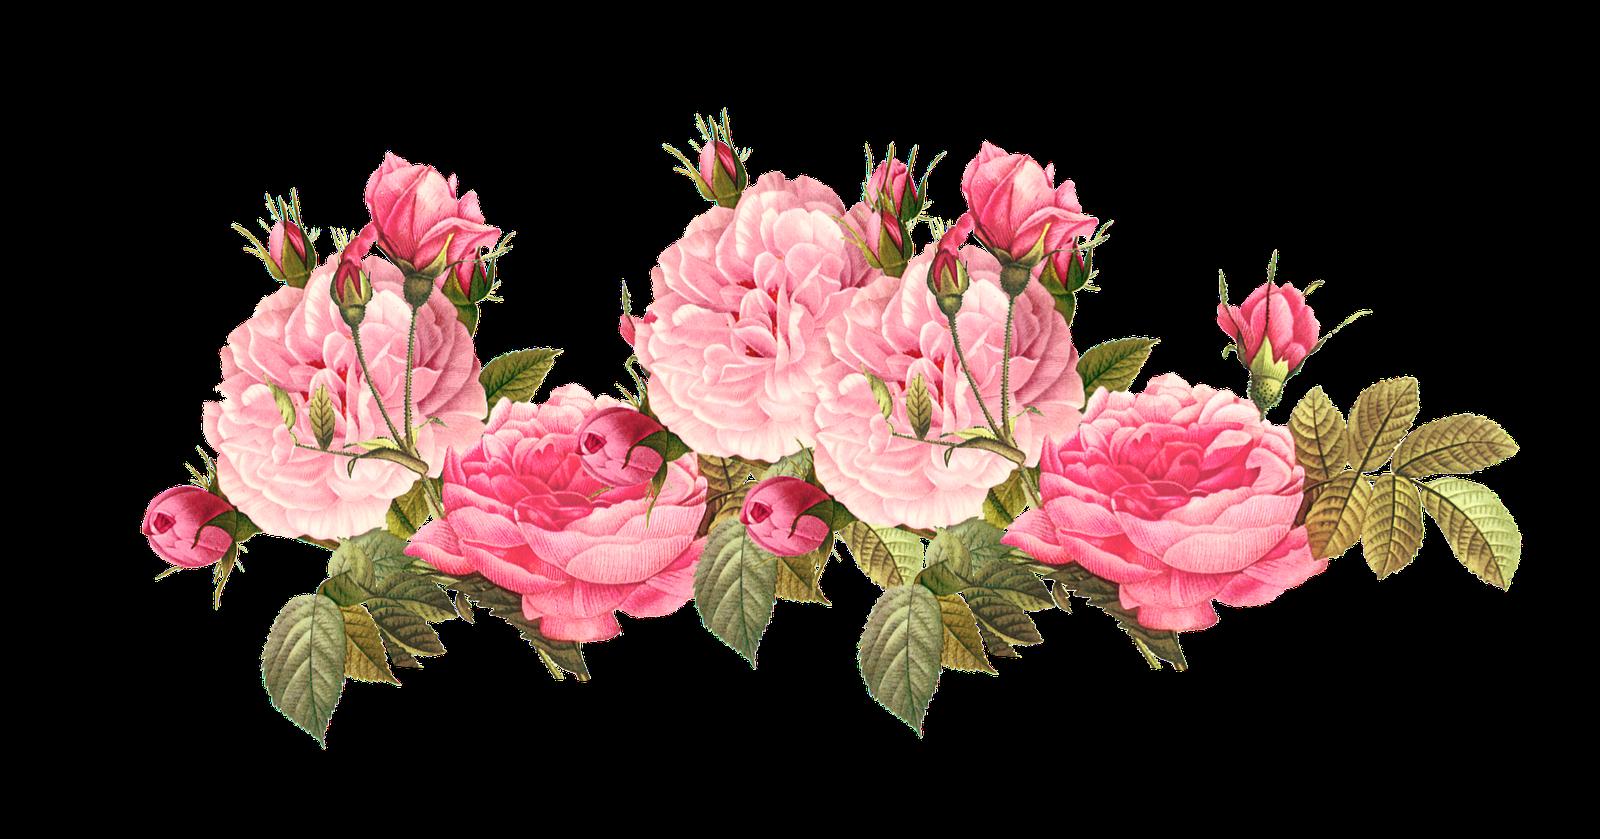 Clipart roses dead rose. Vintage images google search